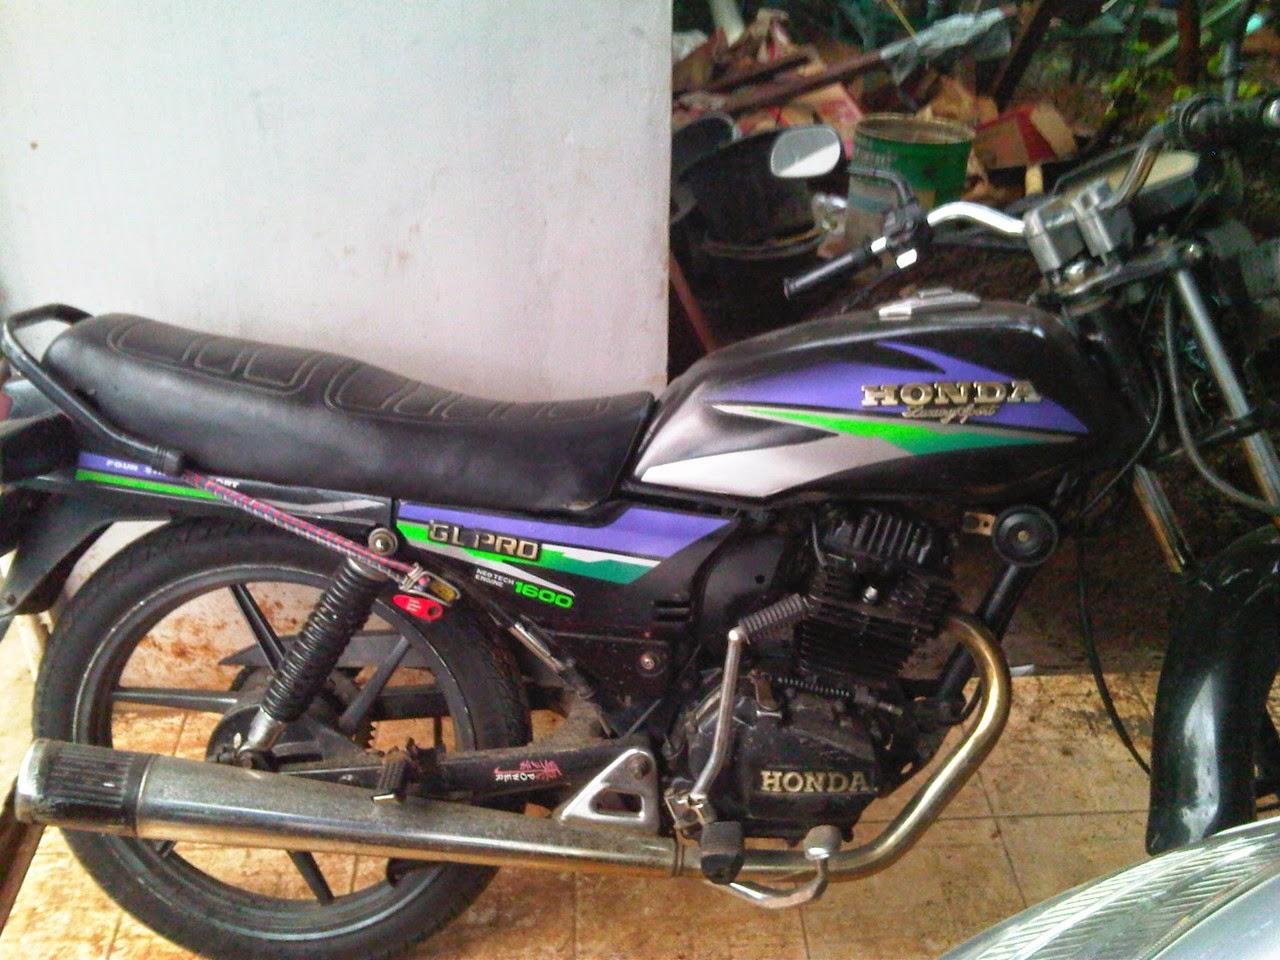 spesifikasi honda gl pro black engine – si hitam powerfull | motor tuo